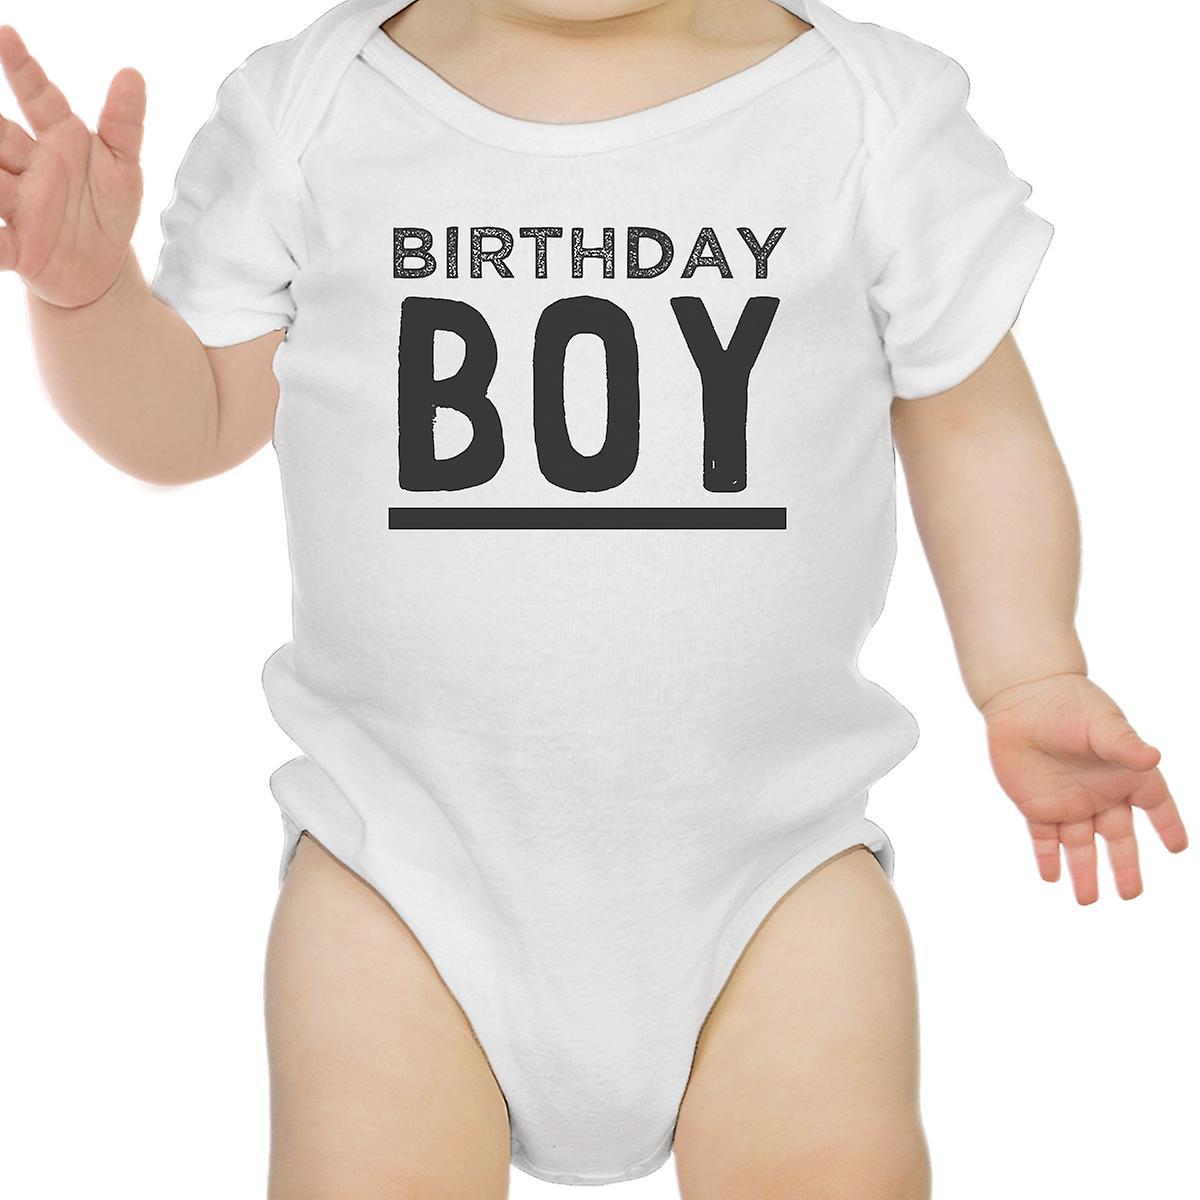 Birthday Boy White Bodysuit Cotton 1st Baby Tee Shirt